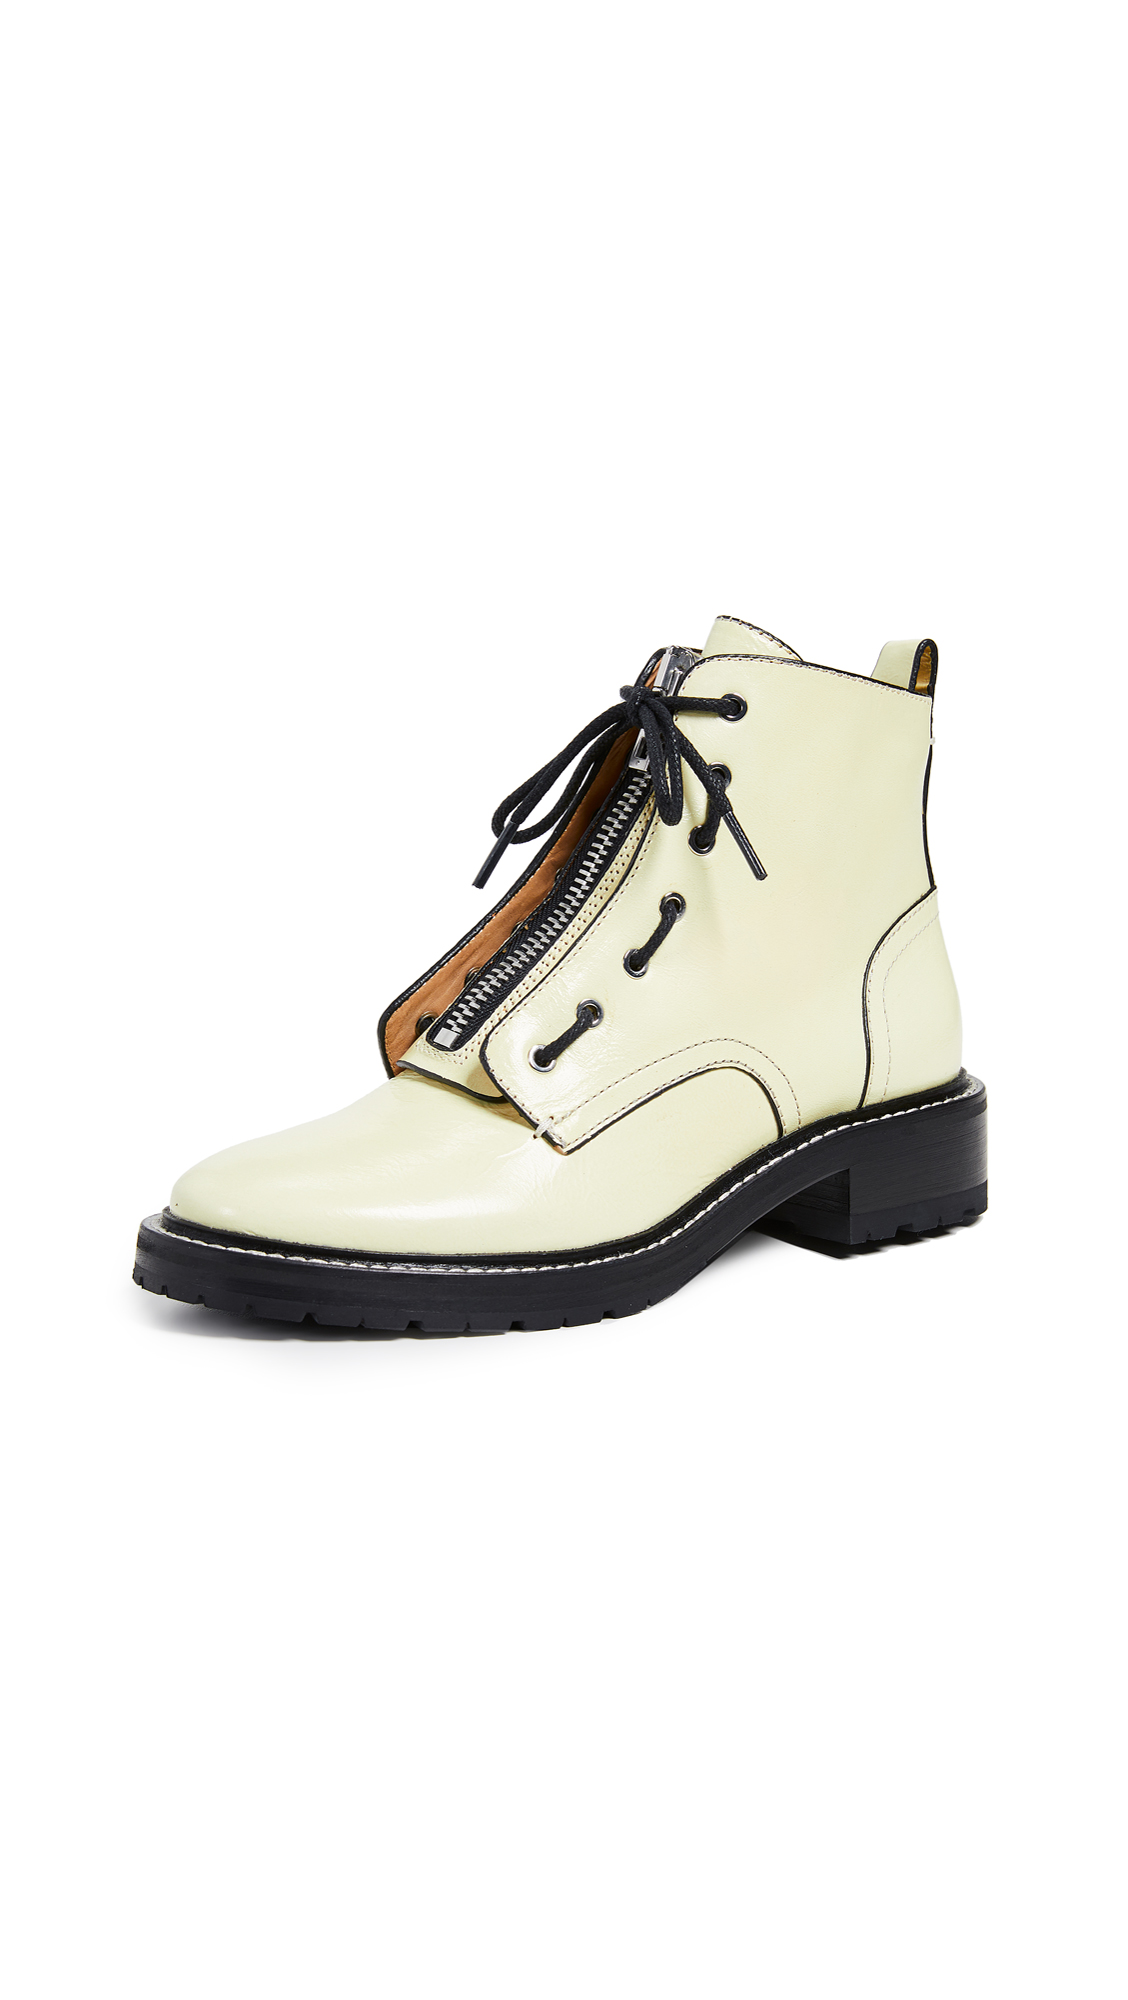 Rag & Bone Cannon Boots - White